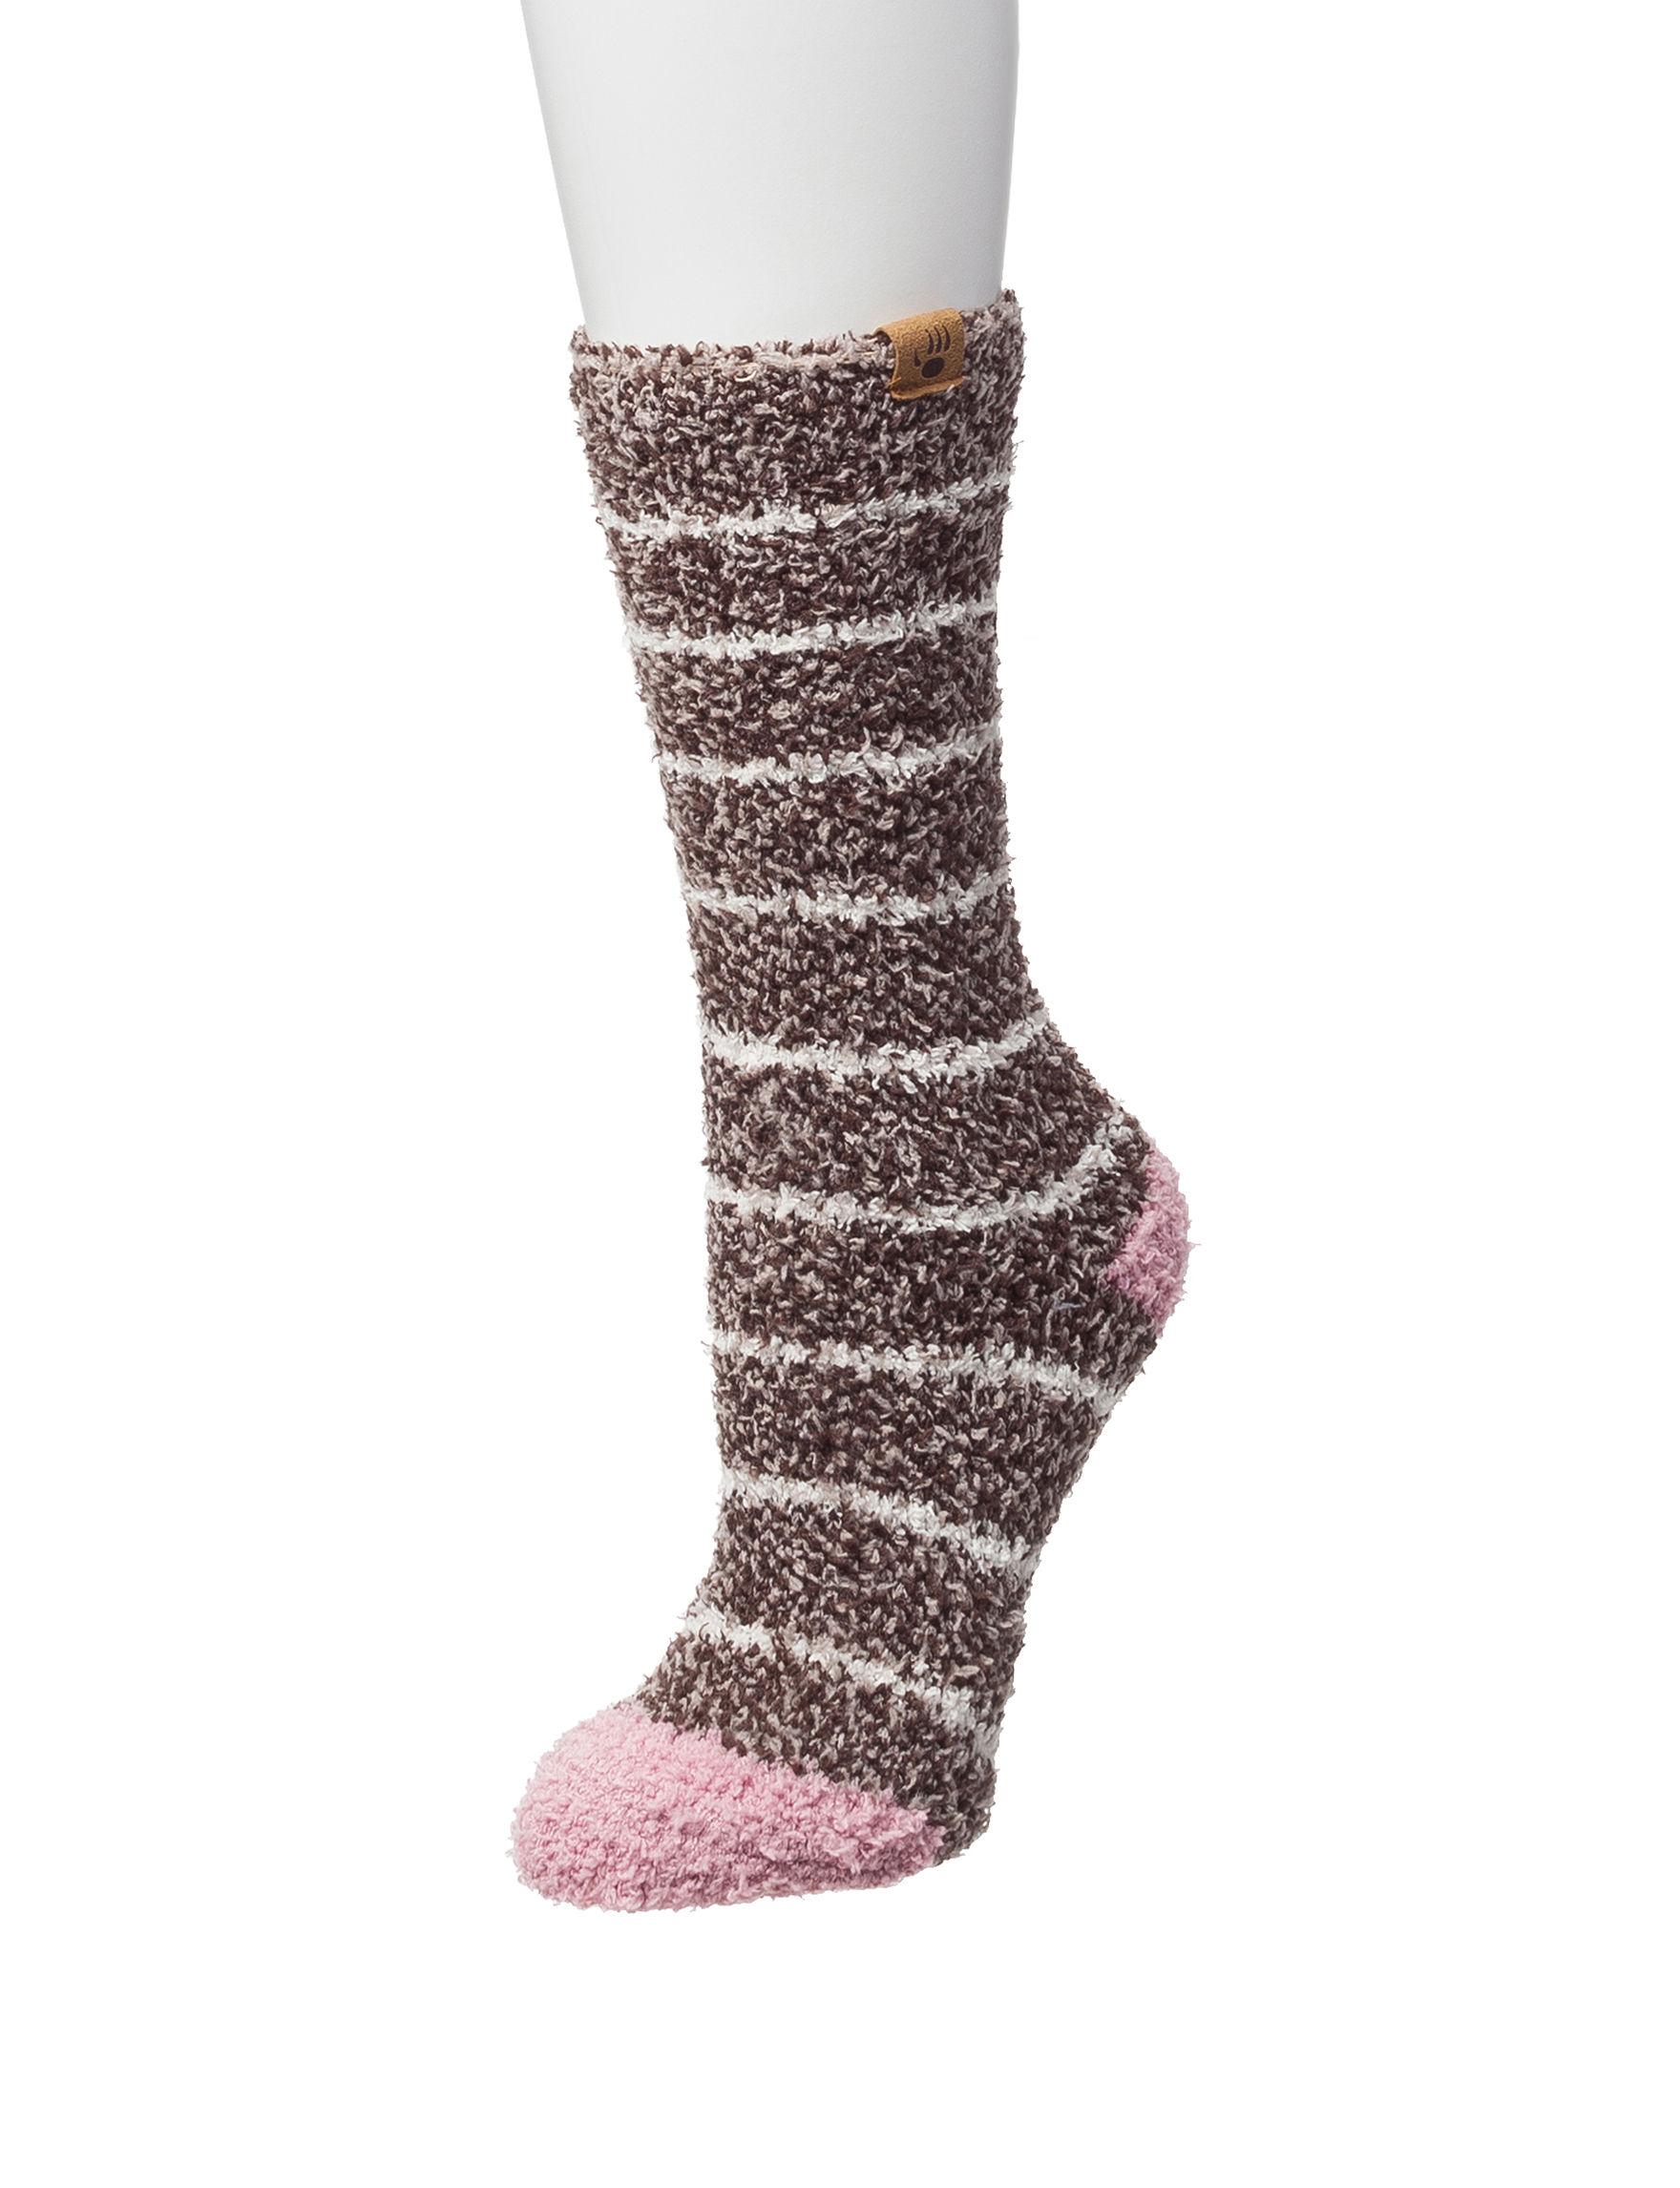 Bearpaw Brown Socks